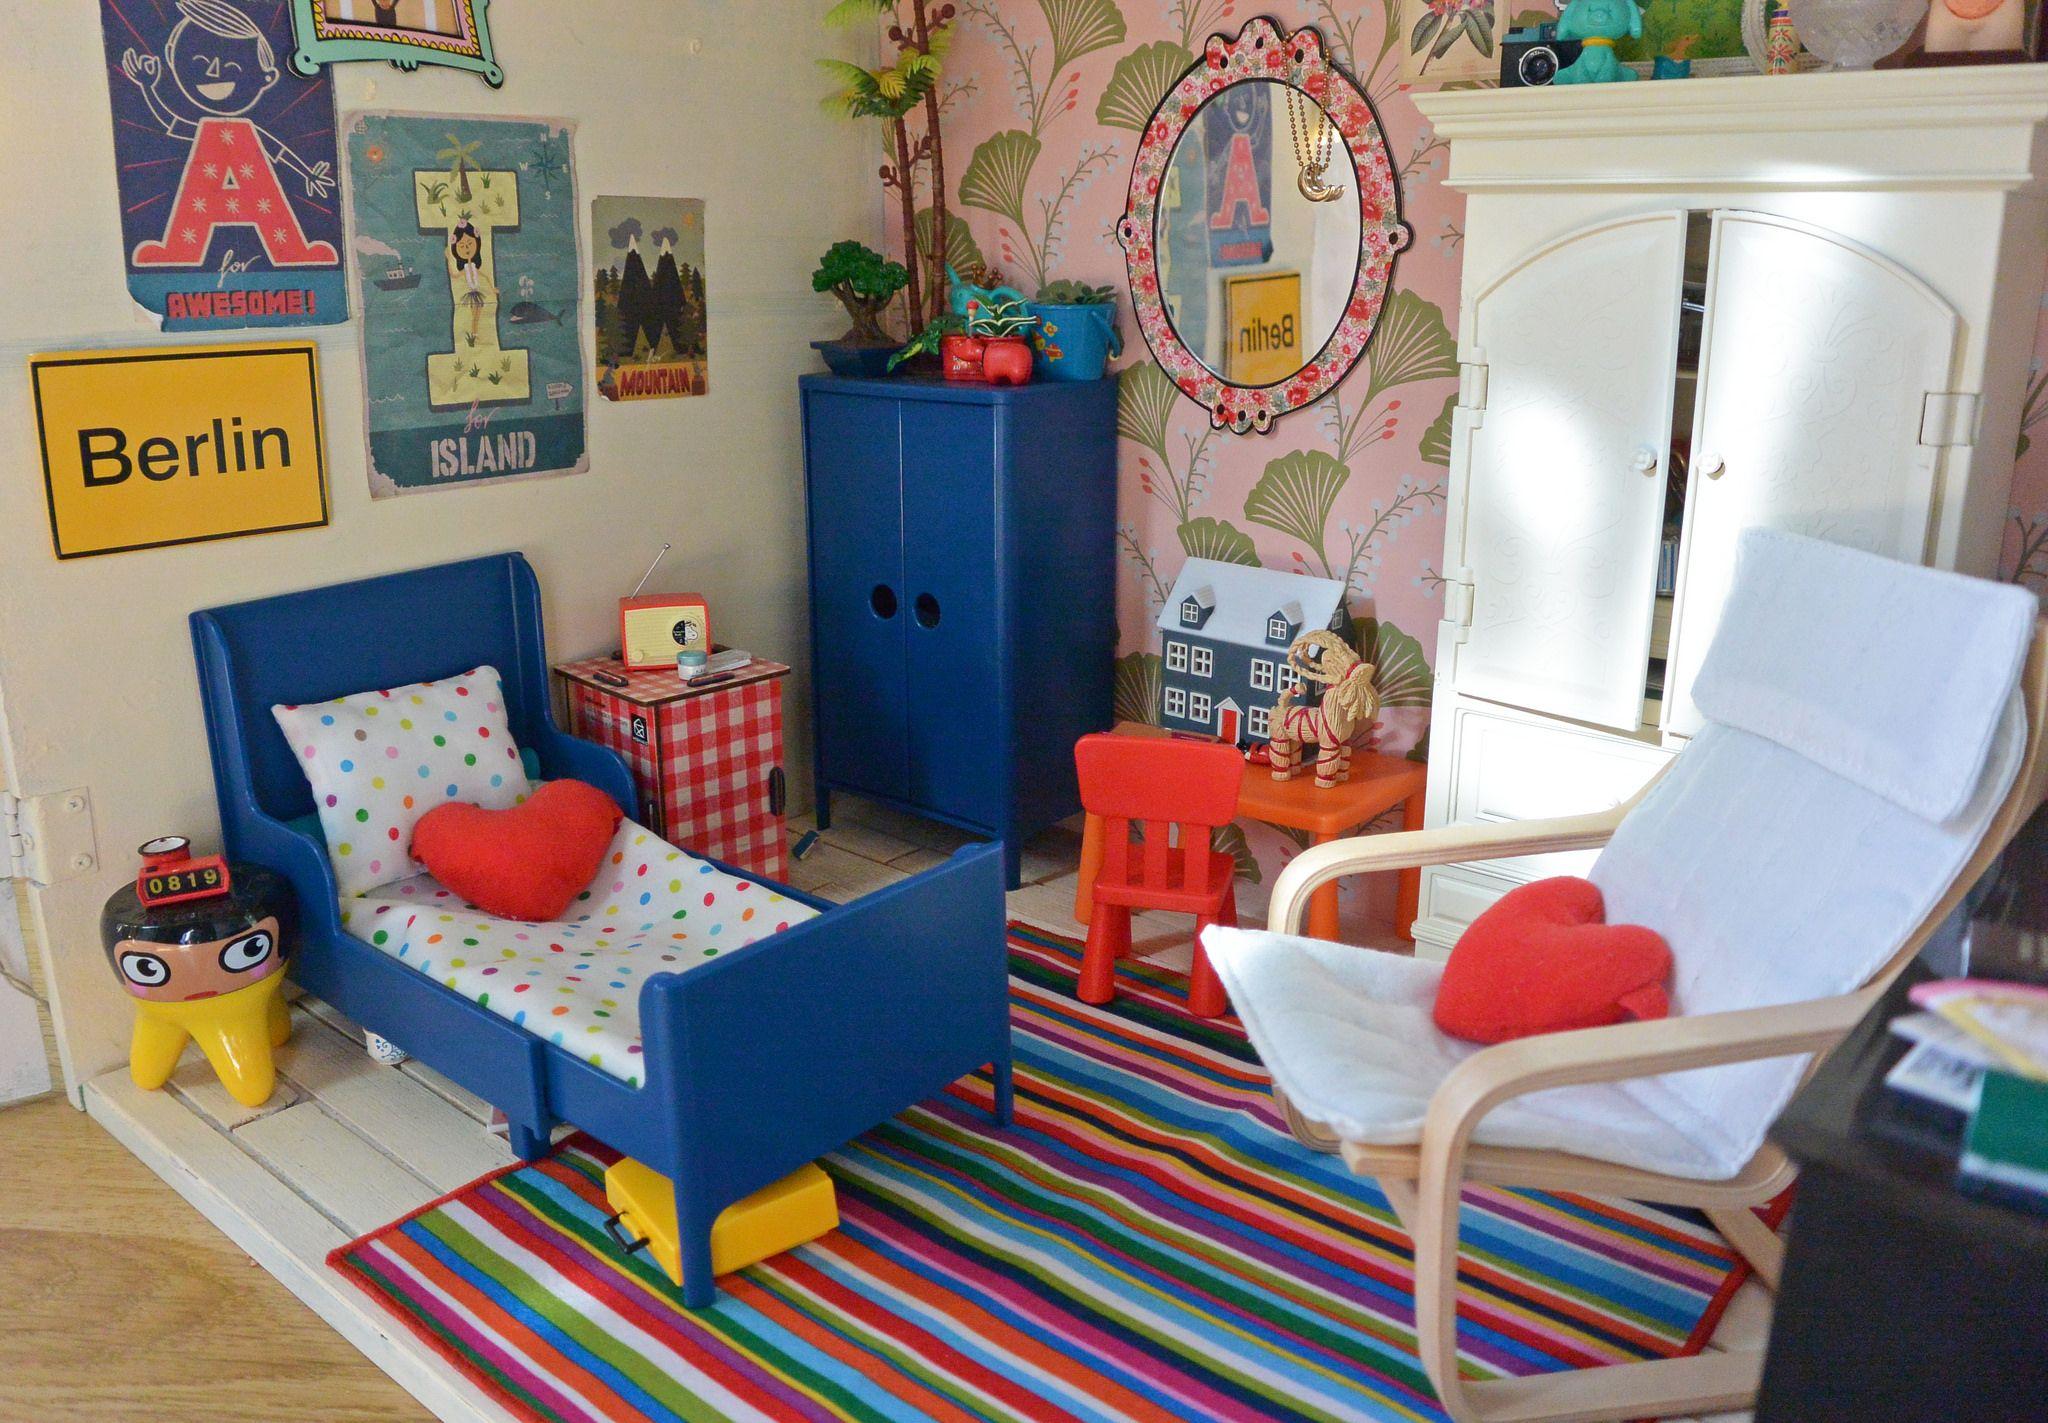 ikea lillabo dollshouse blythe. Ikea Lillabo Dollshouse Blythe. A Forever Ongoing Project - Big Doll Room In Small Dollhouse Blythe I